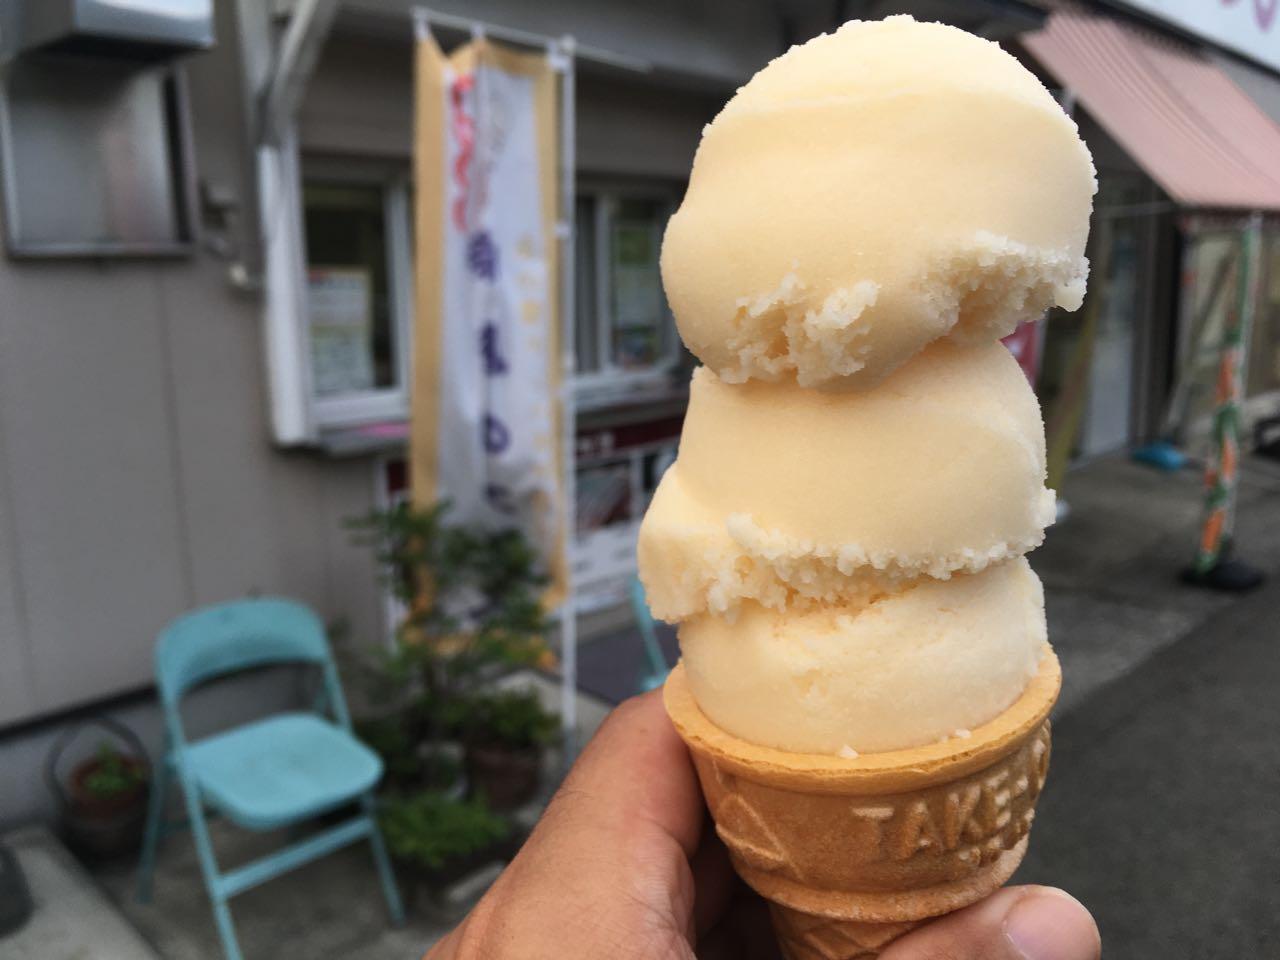 ehime, imabari, にっし〜, みとん今治, アイス, 今治, 峠のアイス, 愛媛, 菊間